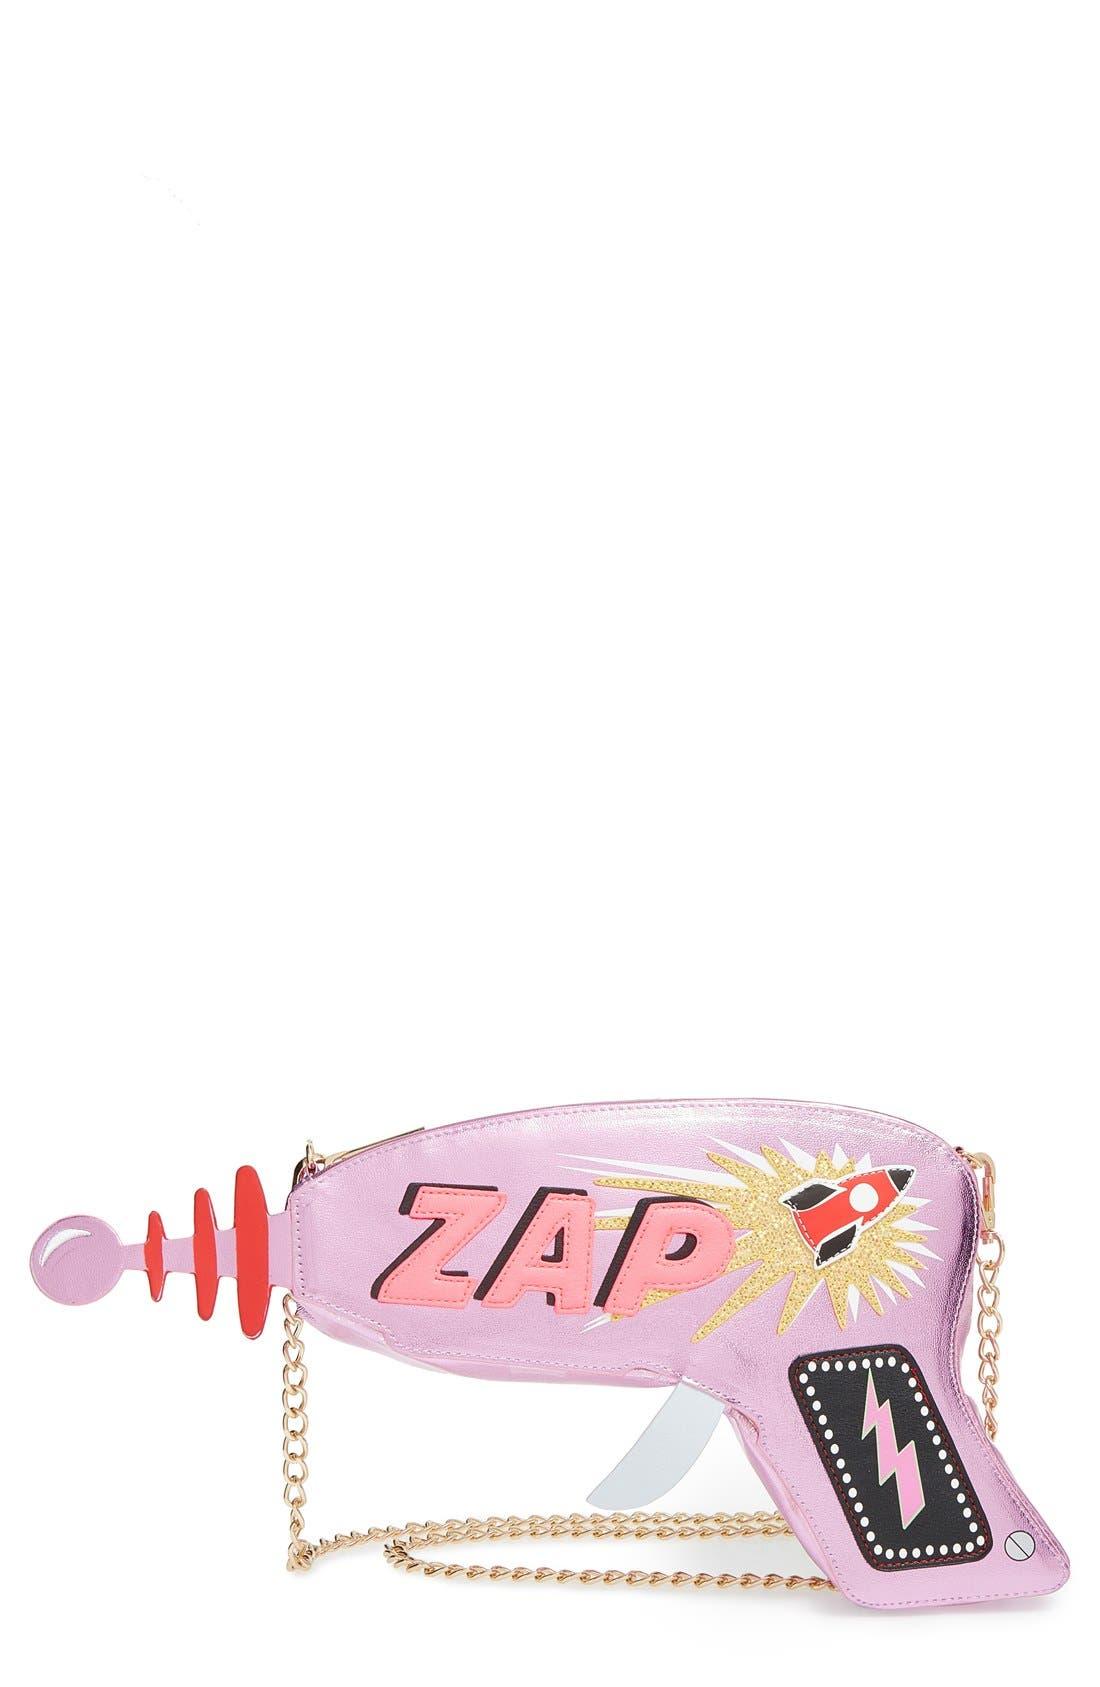 Alternate Image 1 Selected - Skinnydip 'ZAP' Convertible Clutch